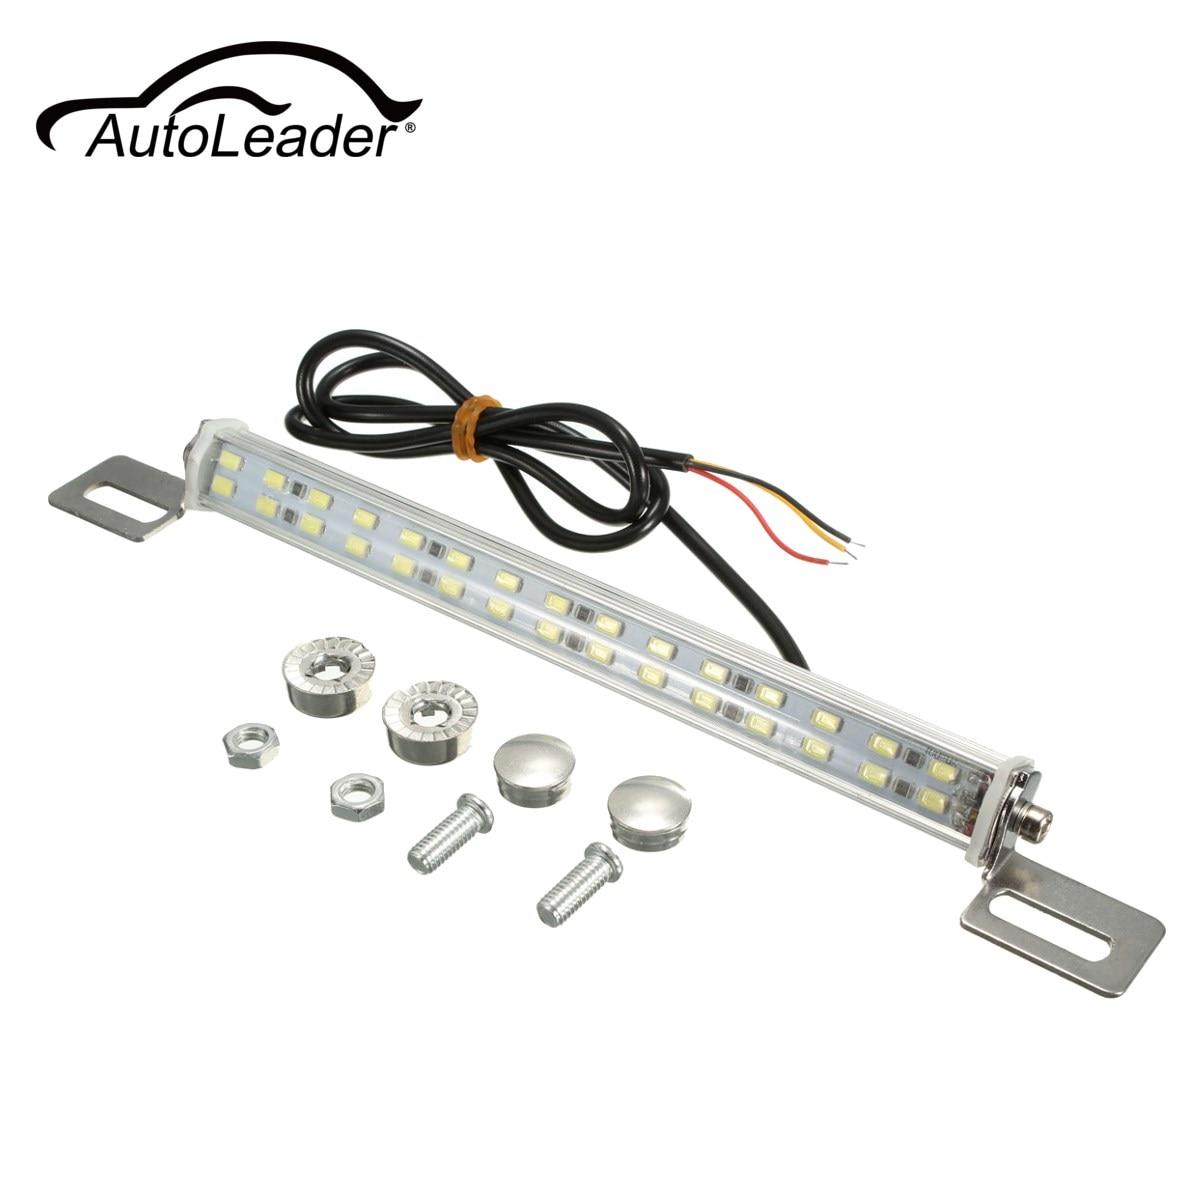 Autoleader Universal 12v 30 Led Car Truck License Plate Backup Reverse Light Number Plate Lamp